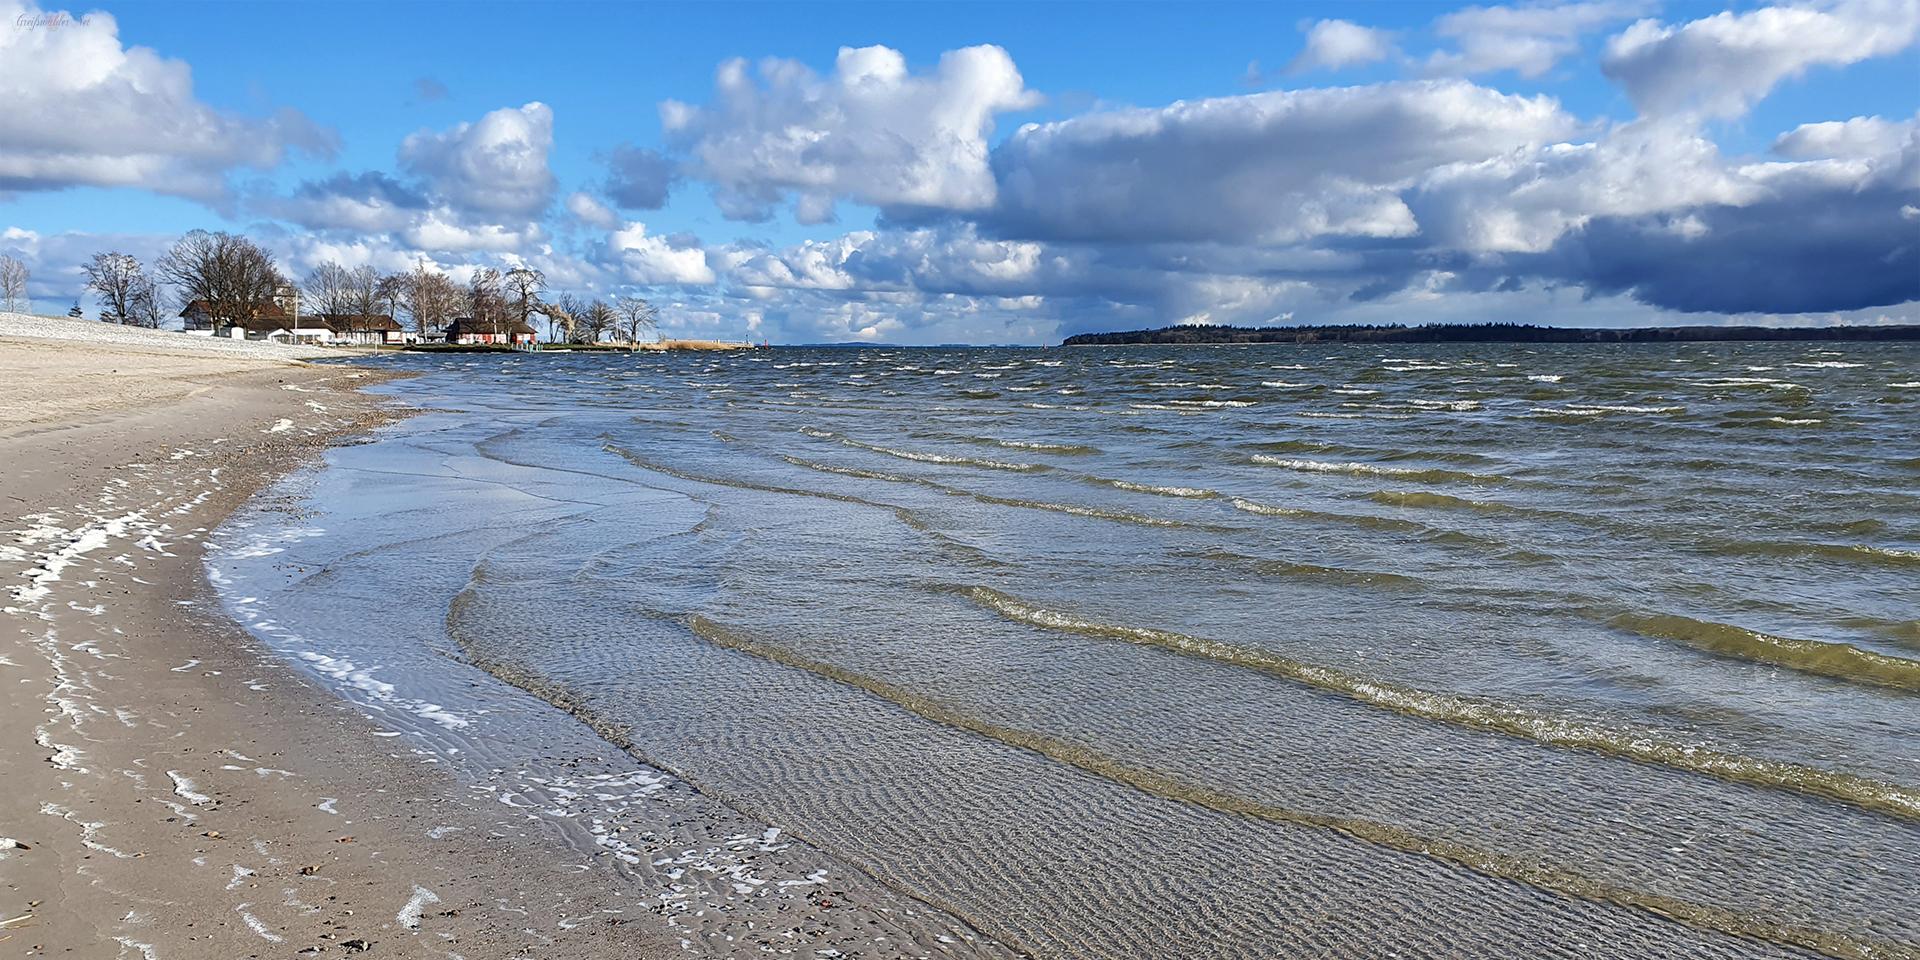 Strand in Greifswald-Eldena - sonnig, windig, kalt